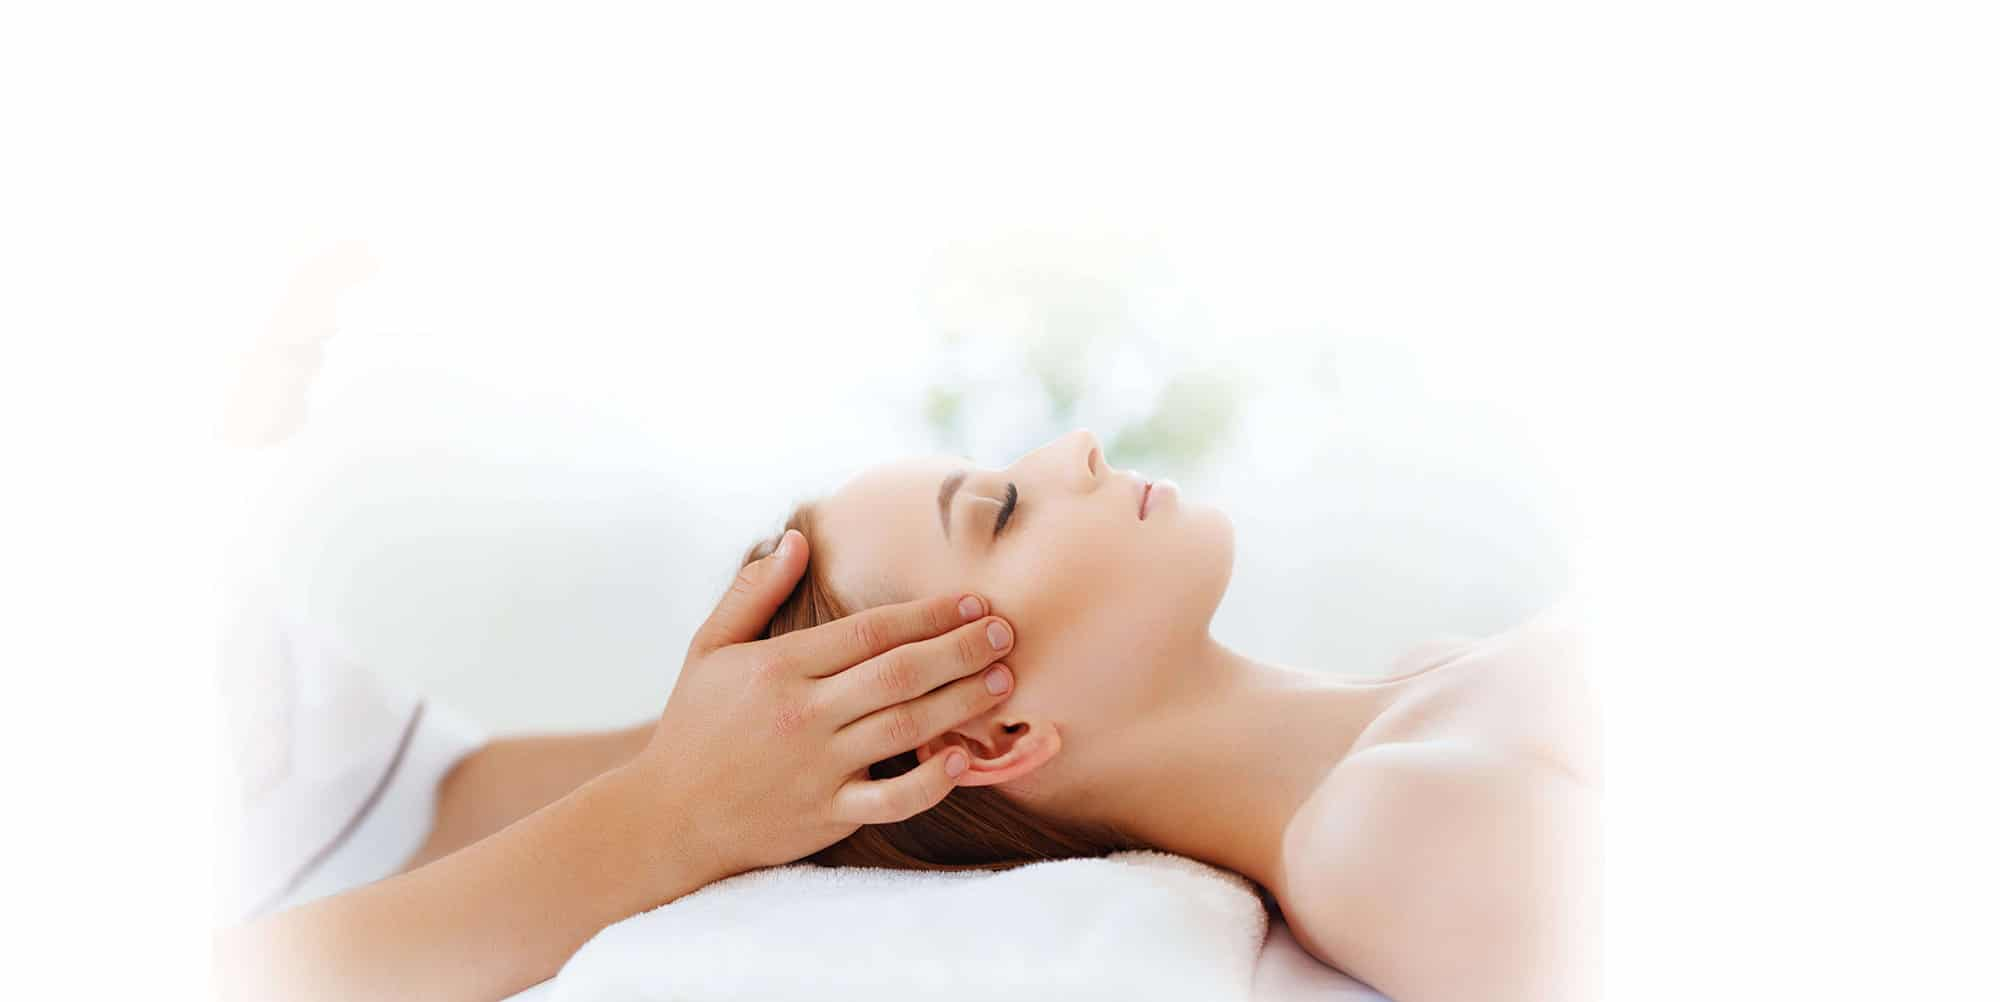 All Your Massage Insurance Needs